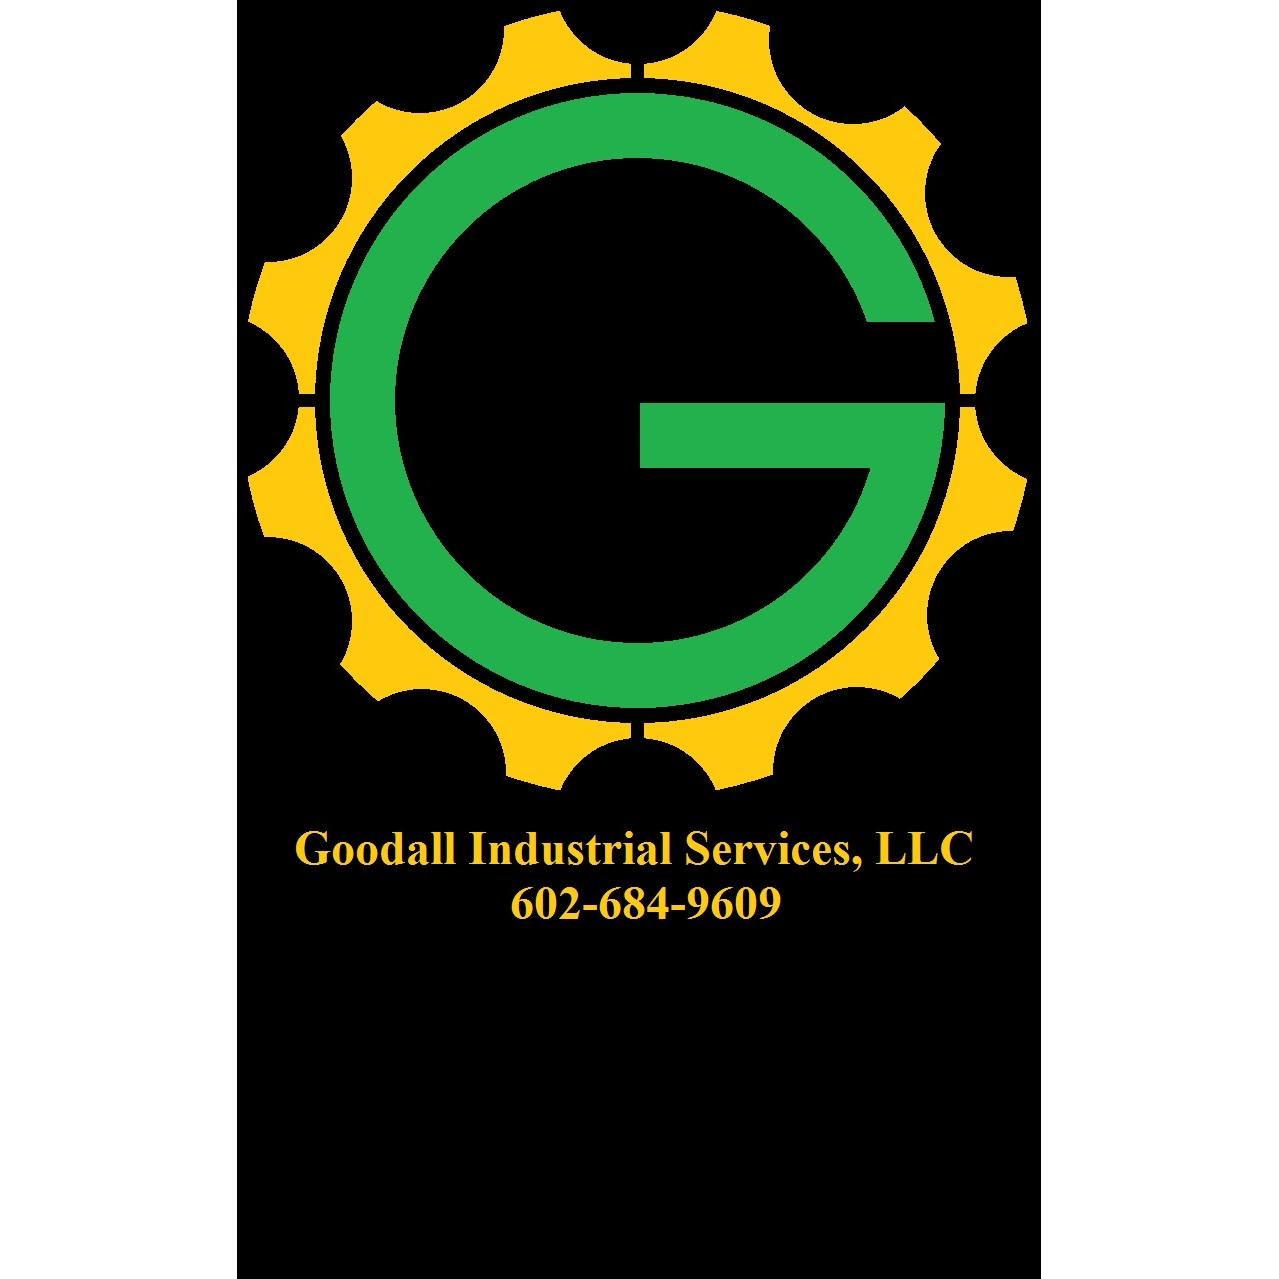 Goodall Industrial Services LLC (G.I.S.M.O.)